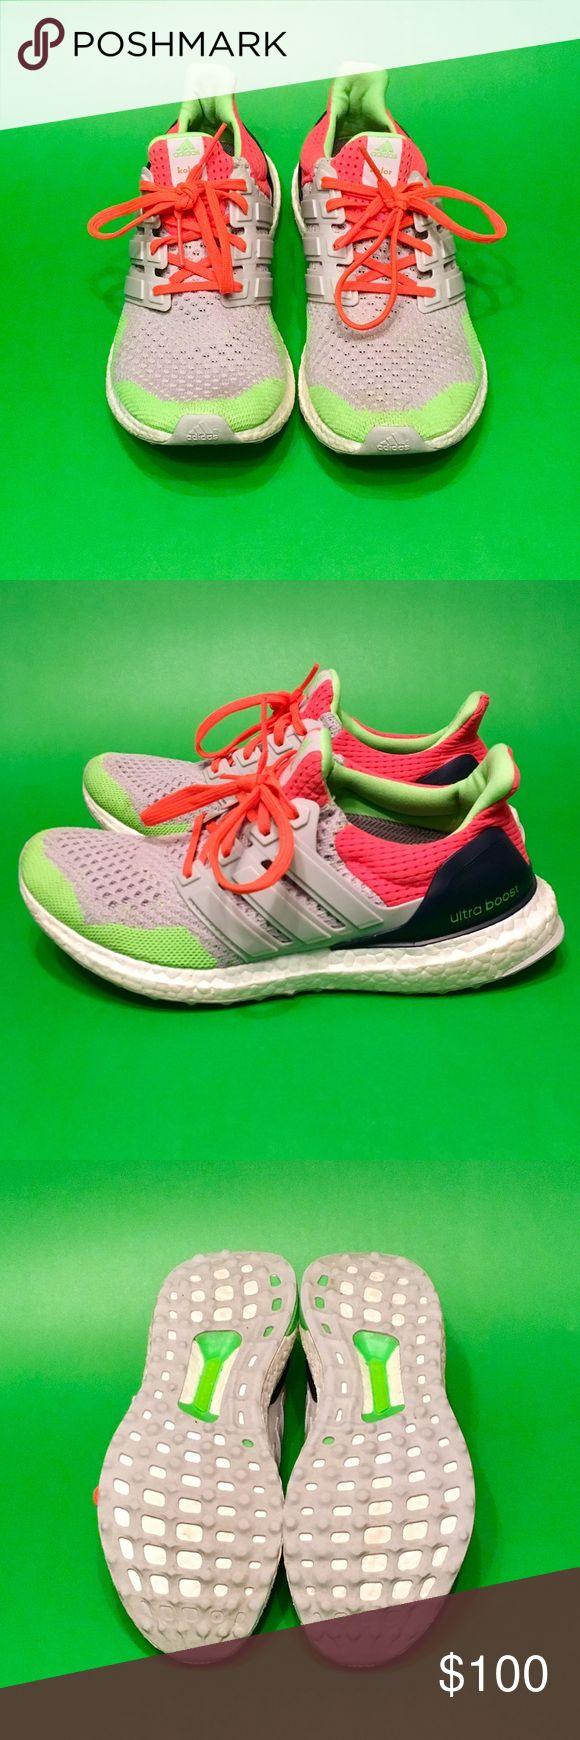 Adidas Ultra Boost Running Shoes Adidas Ultra Boost Running Shoes; worn once Adidas Shoes Sneakers